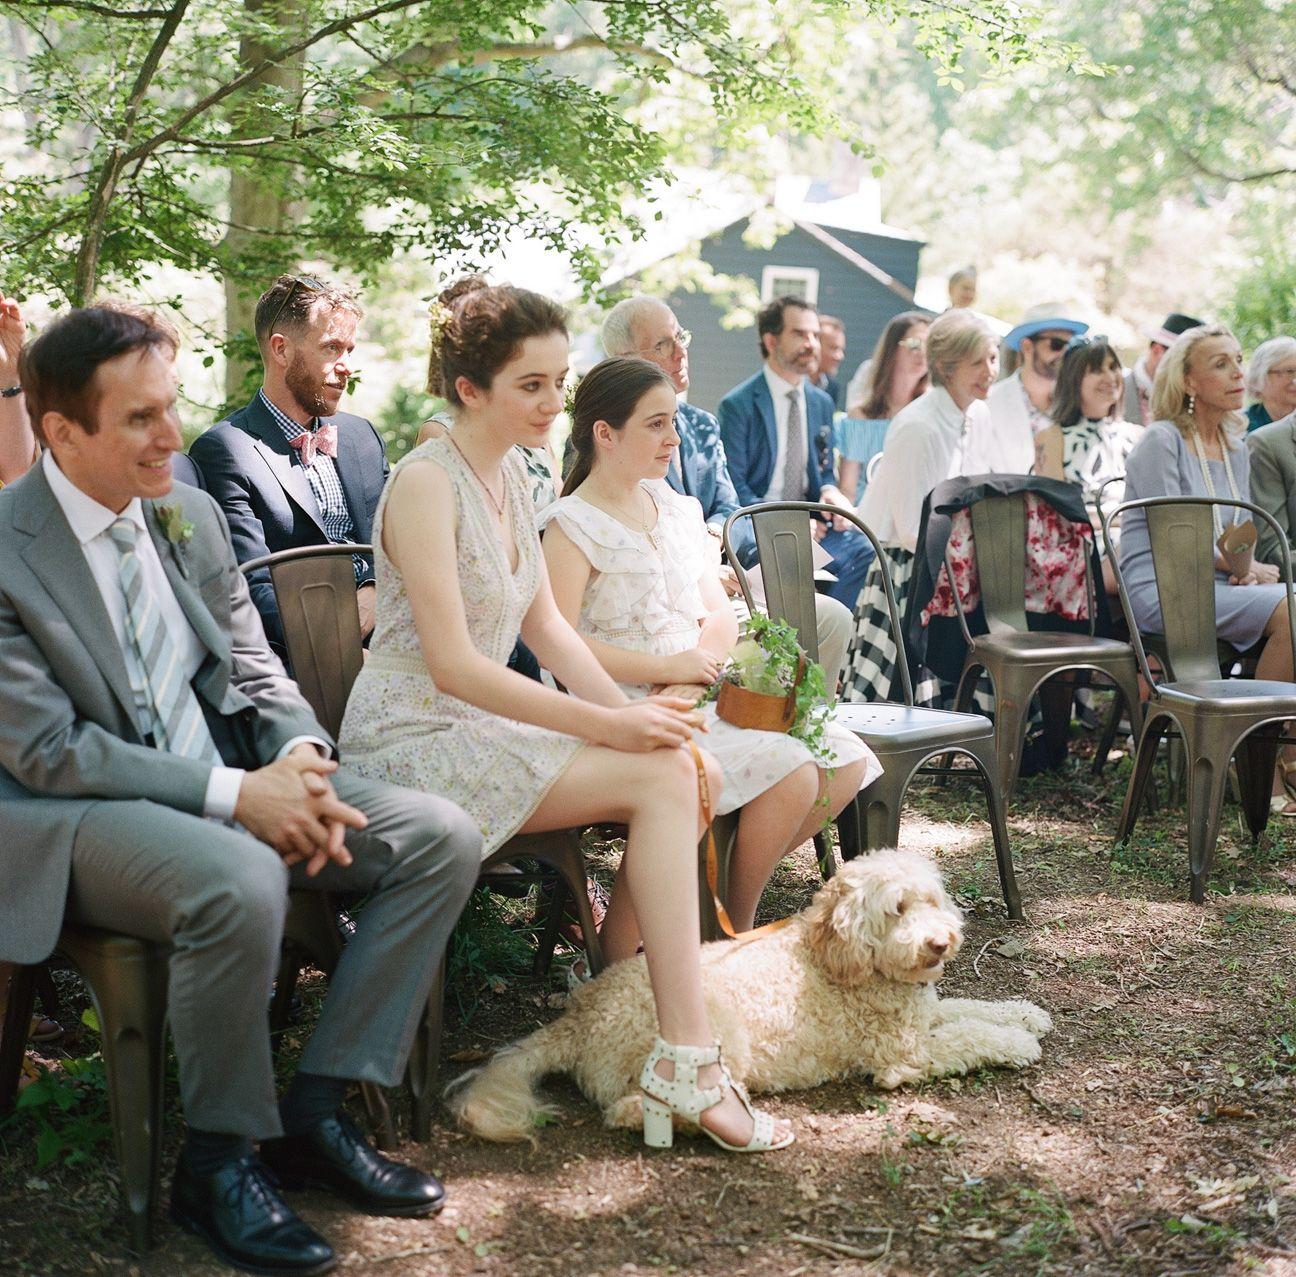 KarenHillPhotography-Regas-Wedding-0359.jpg